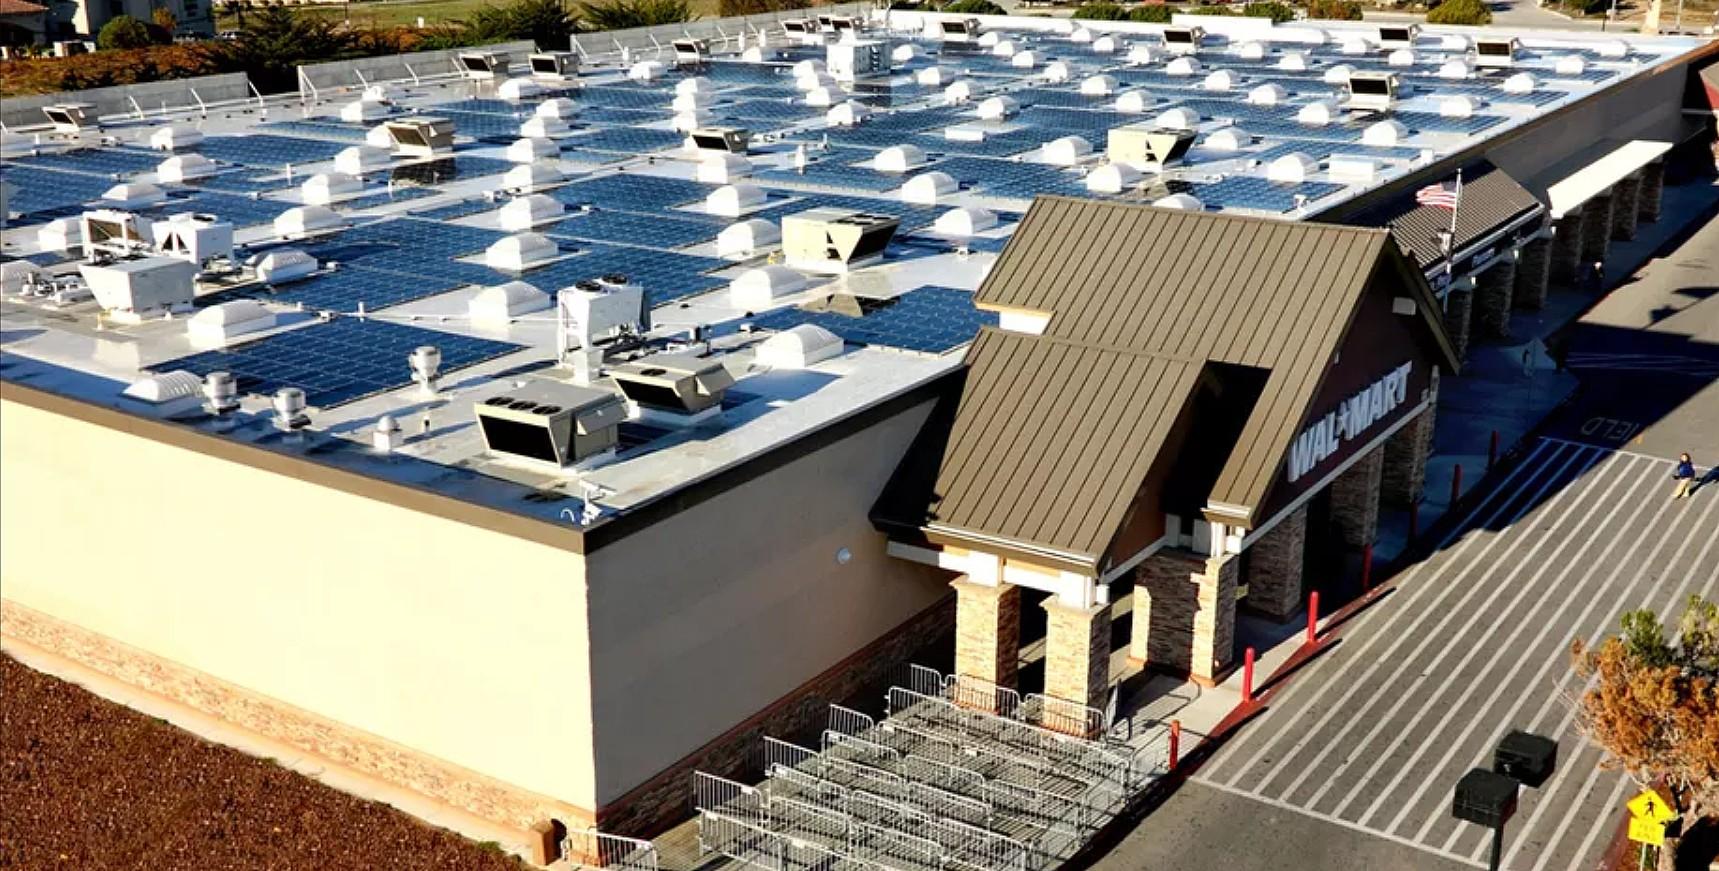 wal-mart-solar-panels